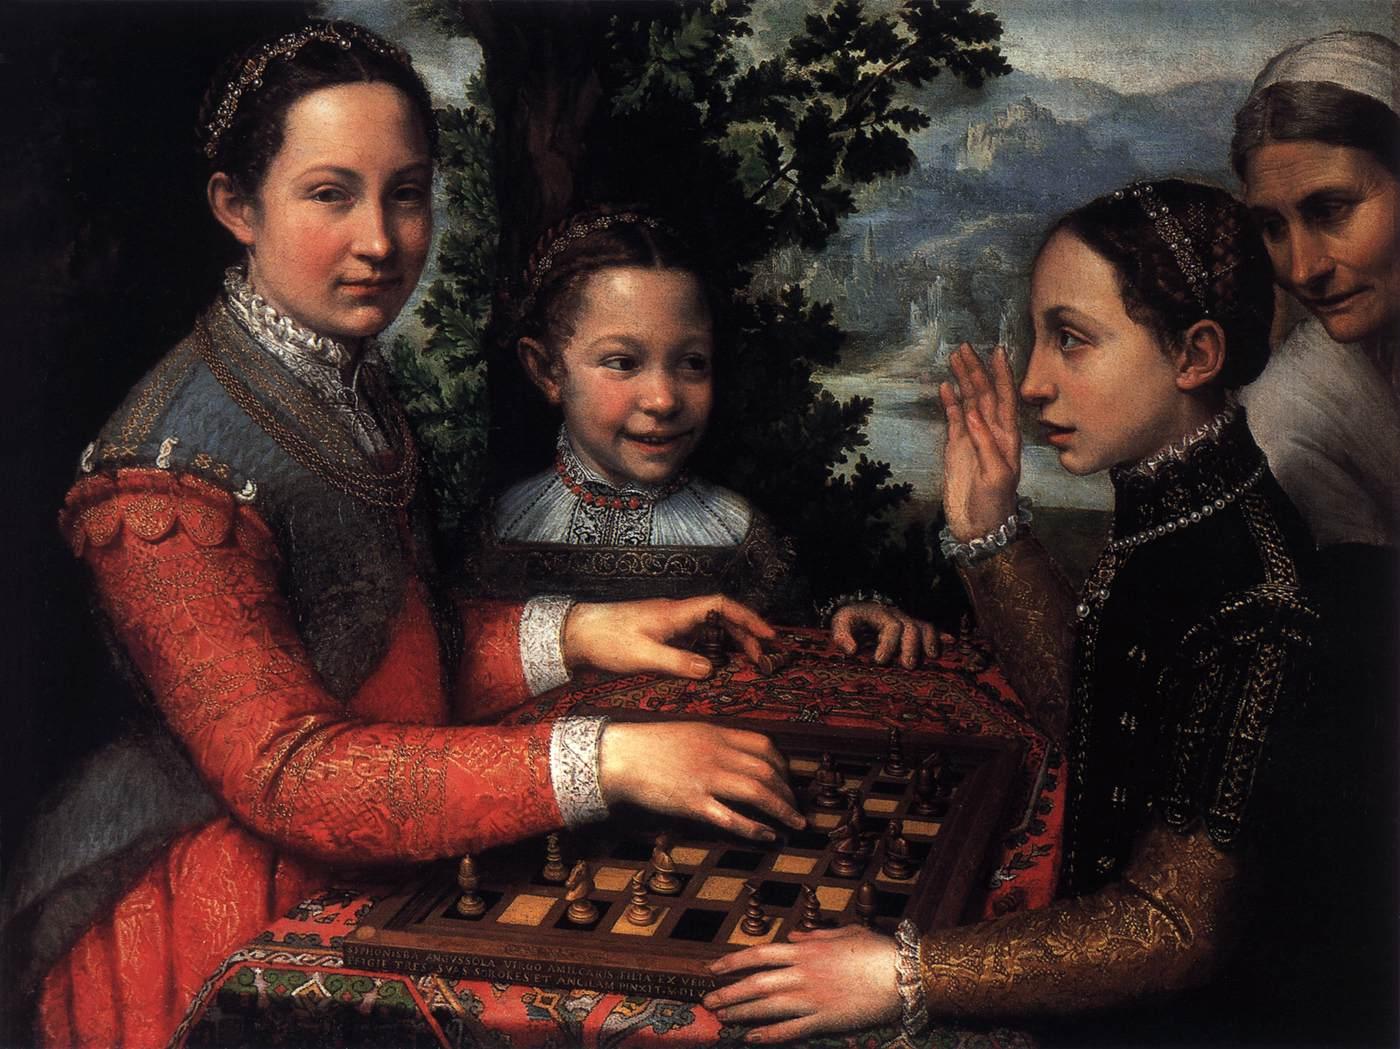 Sofonisba ANGUISSOLA - Πορτρέτα από τις αδερφές του καλλιτέχνη να παίζουν σκάκι  1555